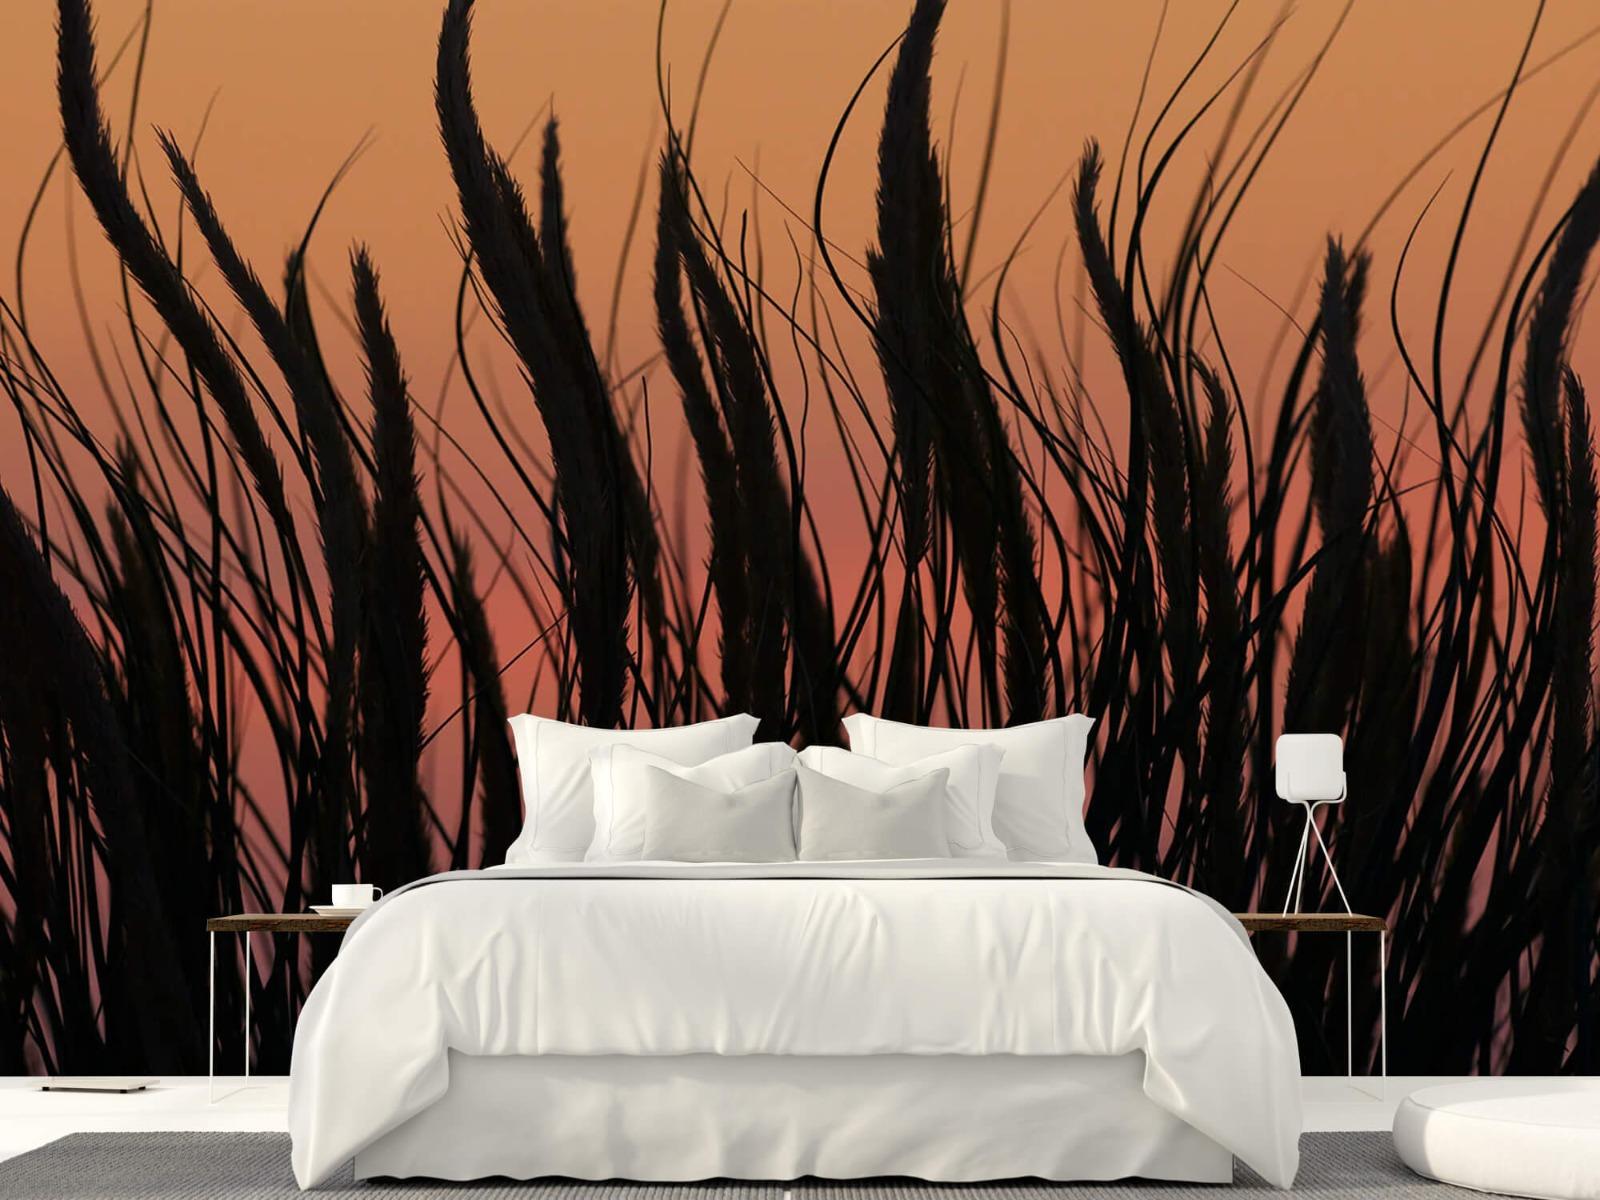 Zomer behang - Helmgras in de avond - Slaapkamer 22